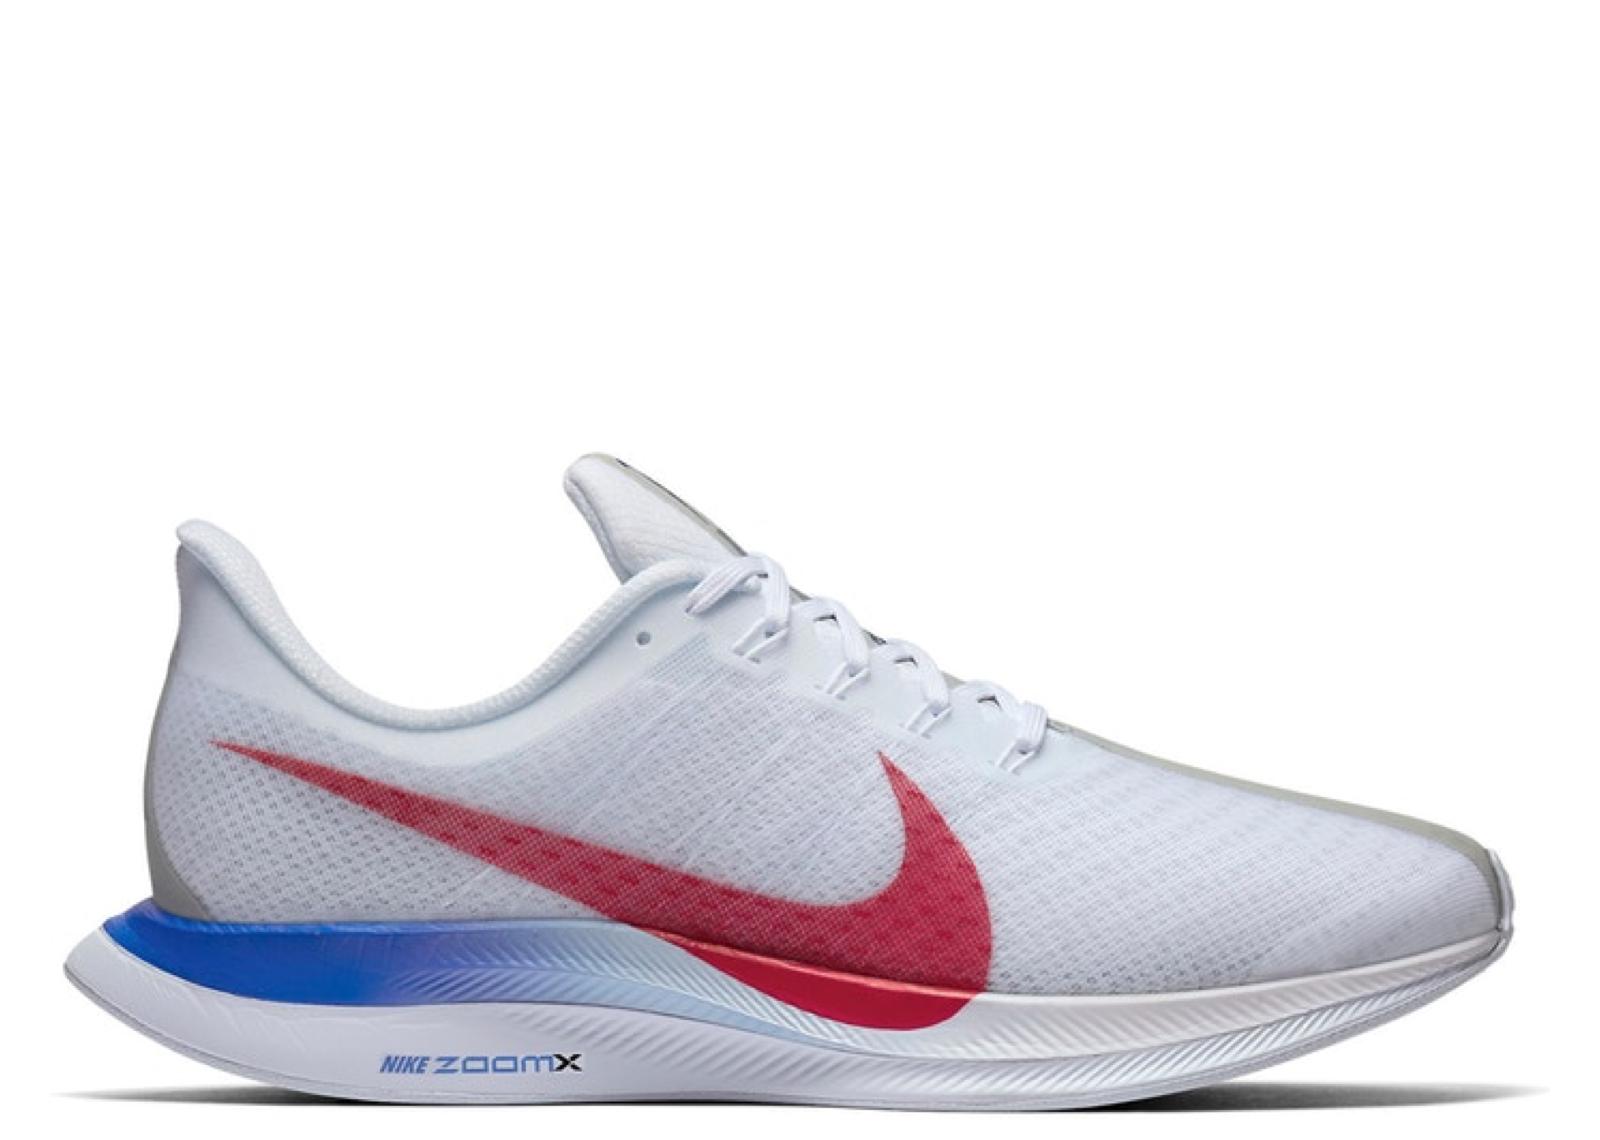 on sale 08d49 26584 Kick Avenue - Authentic Sneakers